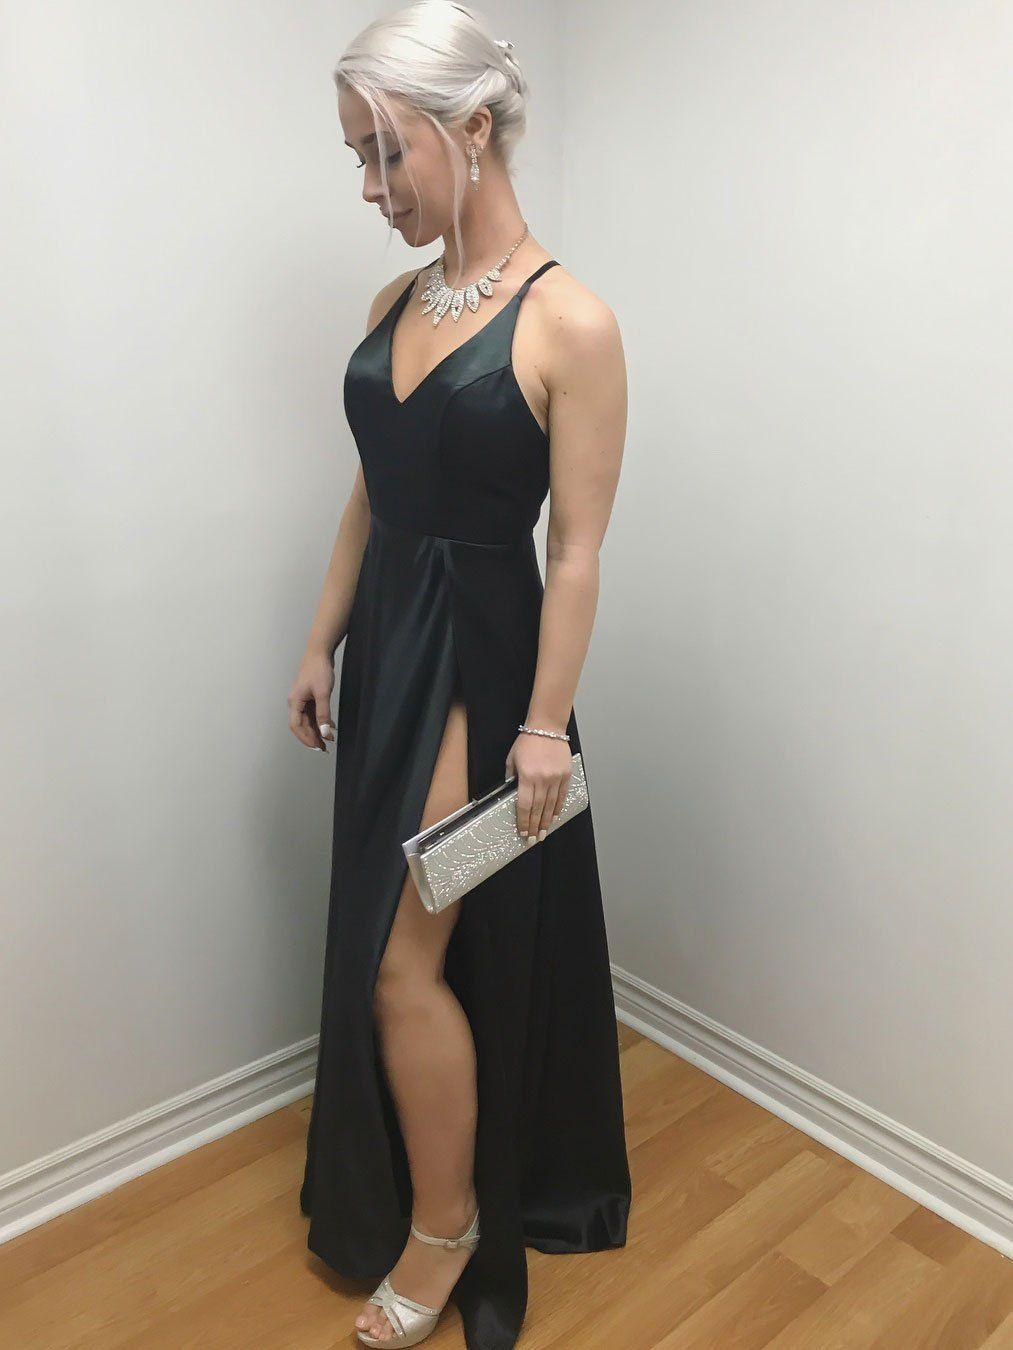 Simple satin spaghetti straps neckline aline prom dresses with slit